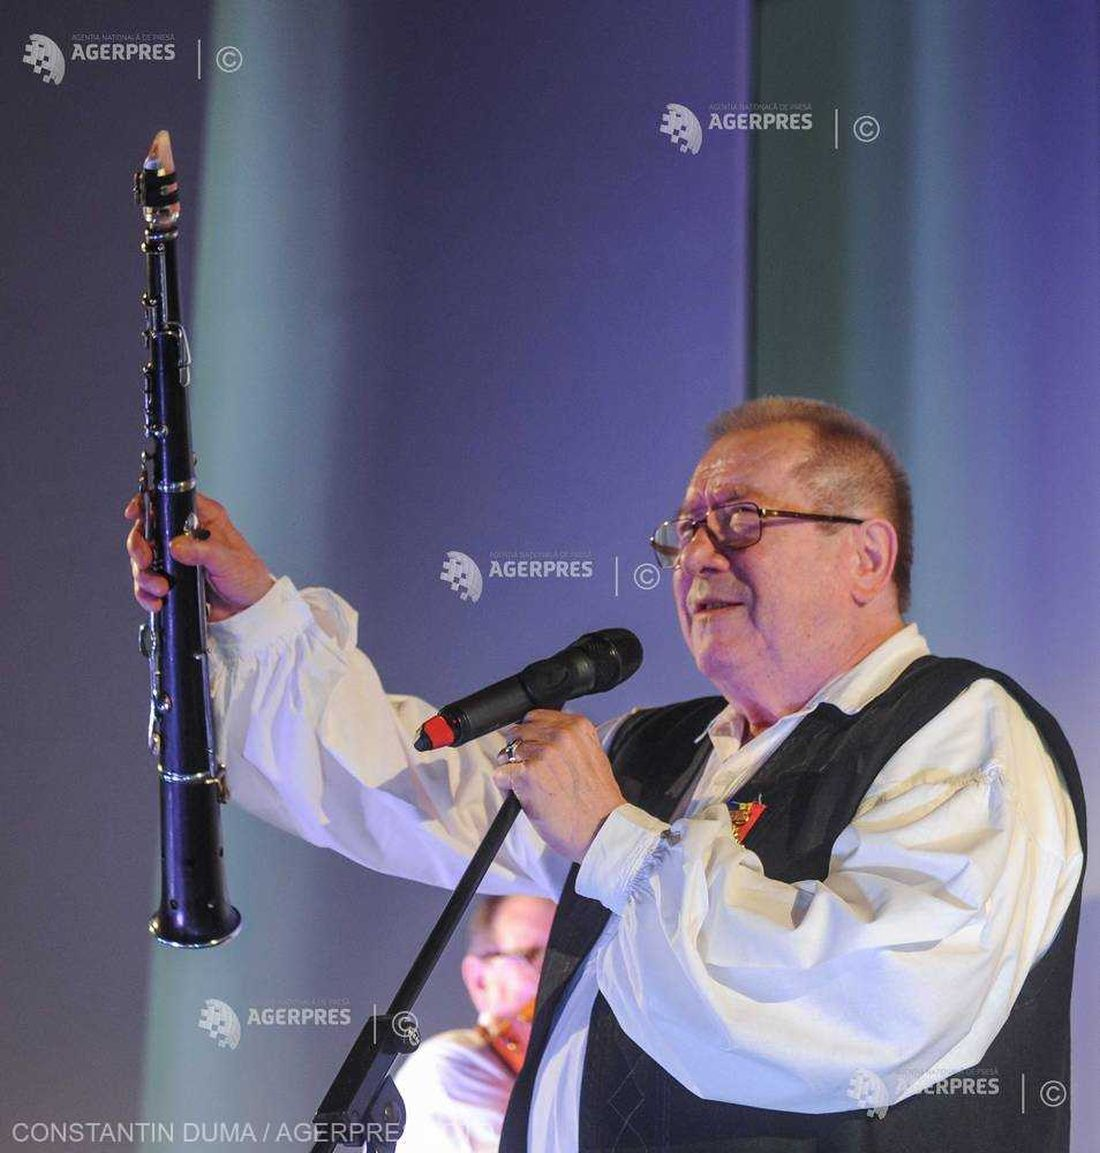 8149509 8149509 Dumitru Farcas la 80 de ani la Cluj-Napoca.1100 (foto credit AGERPRES by Constantin Duma)